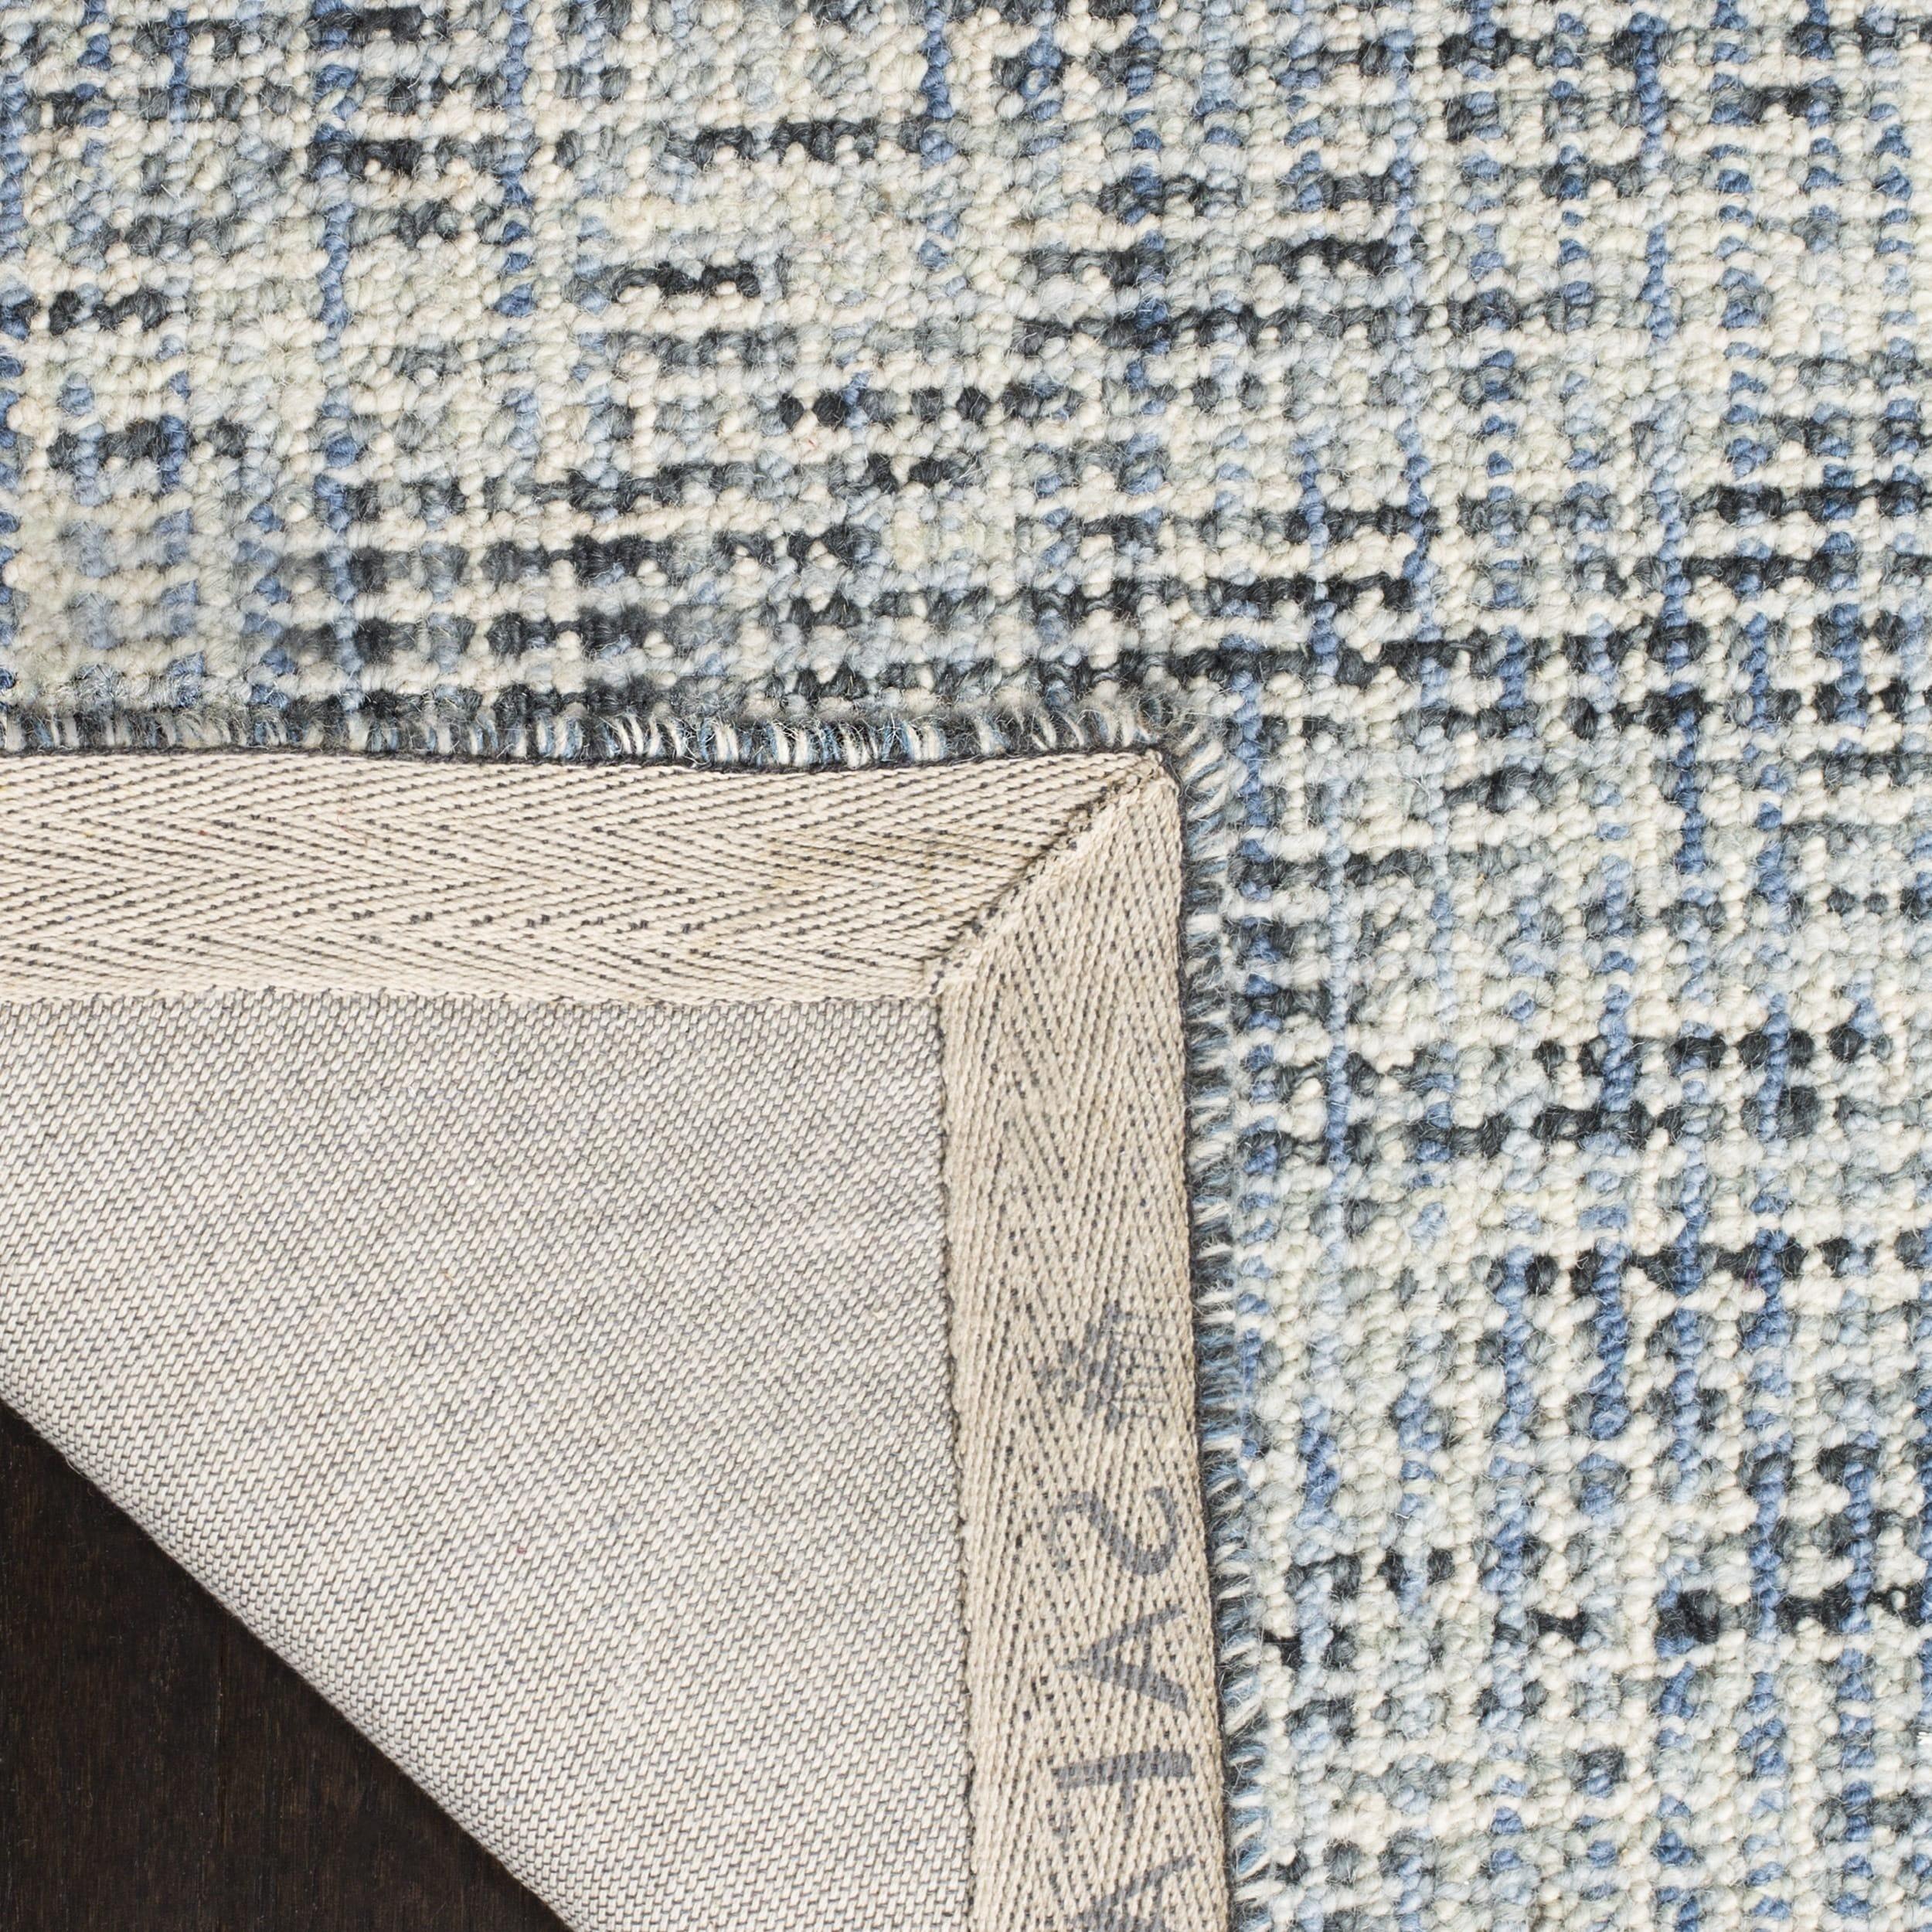 itm handmade rug nuloom x blue not apply does geometric modern